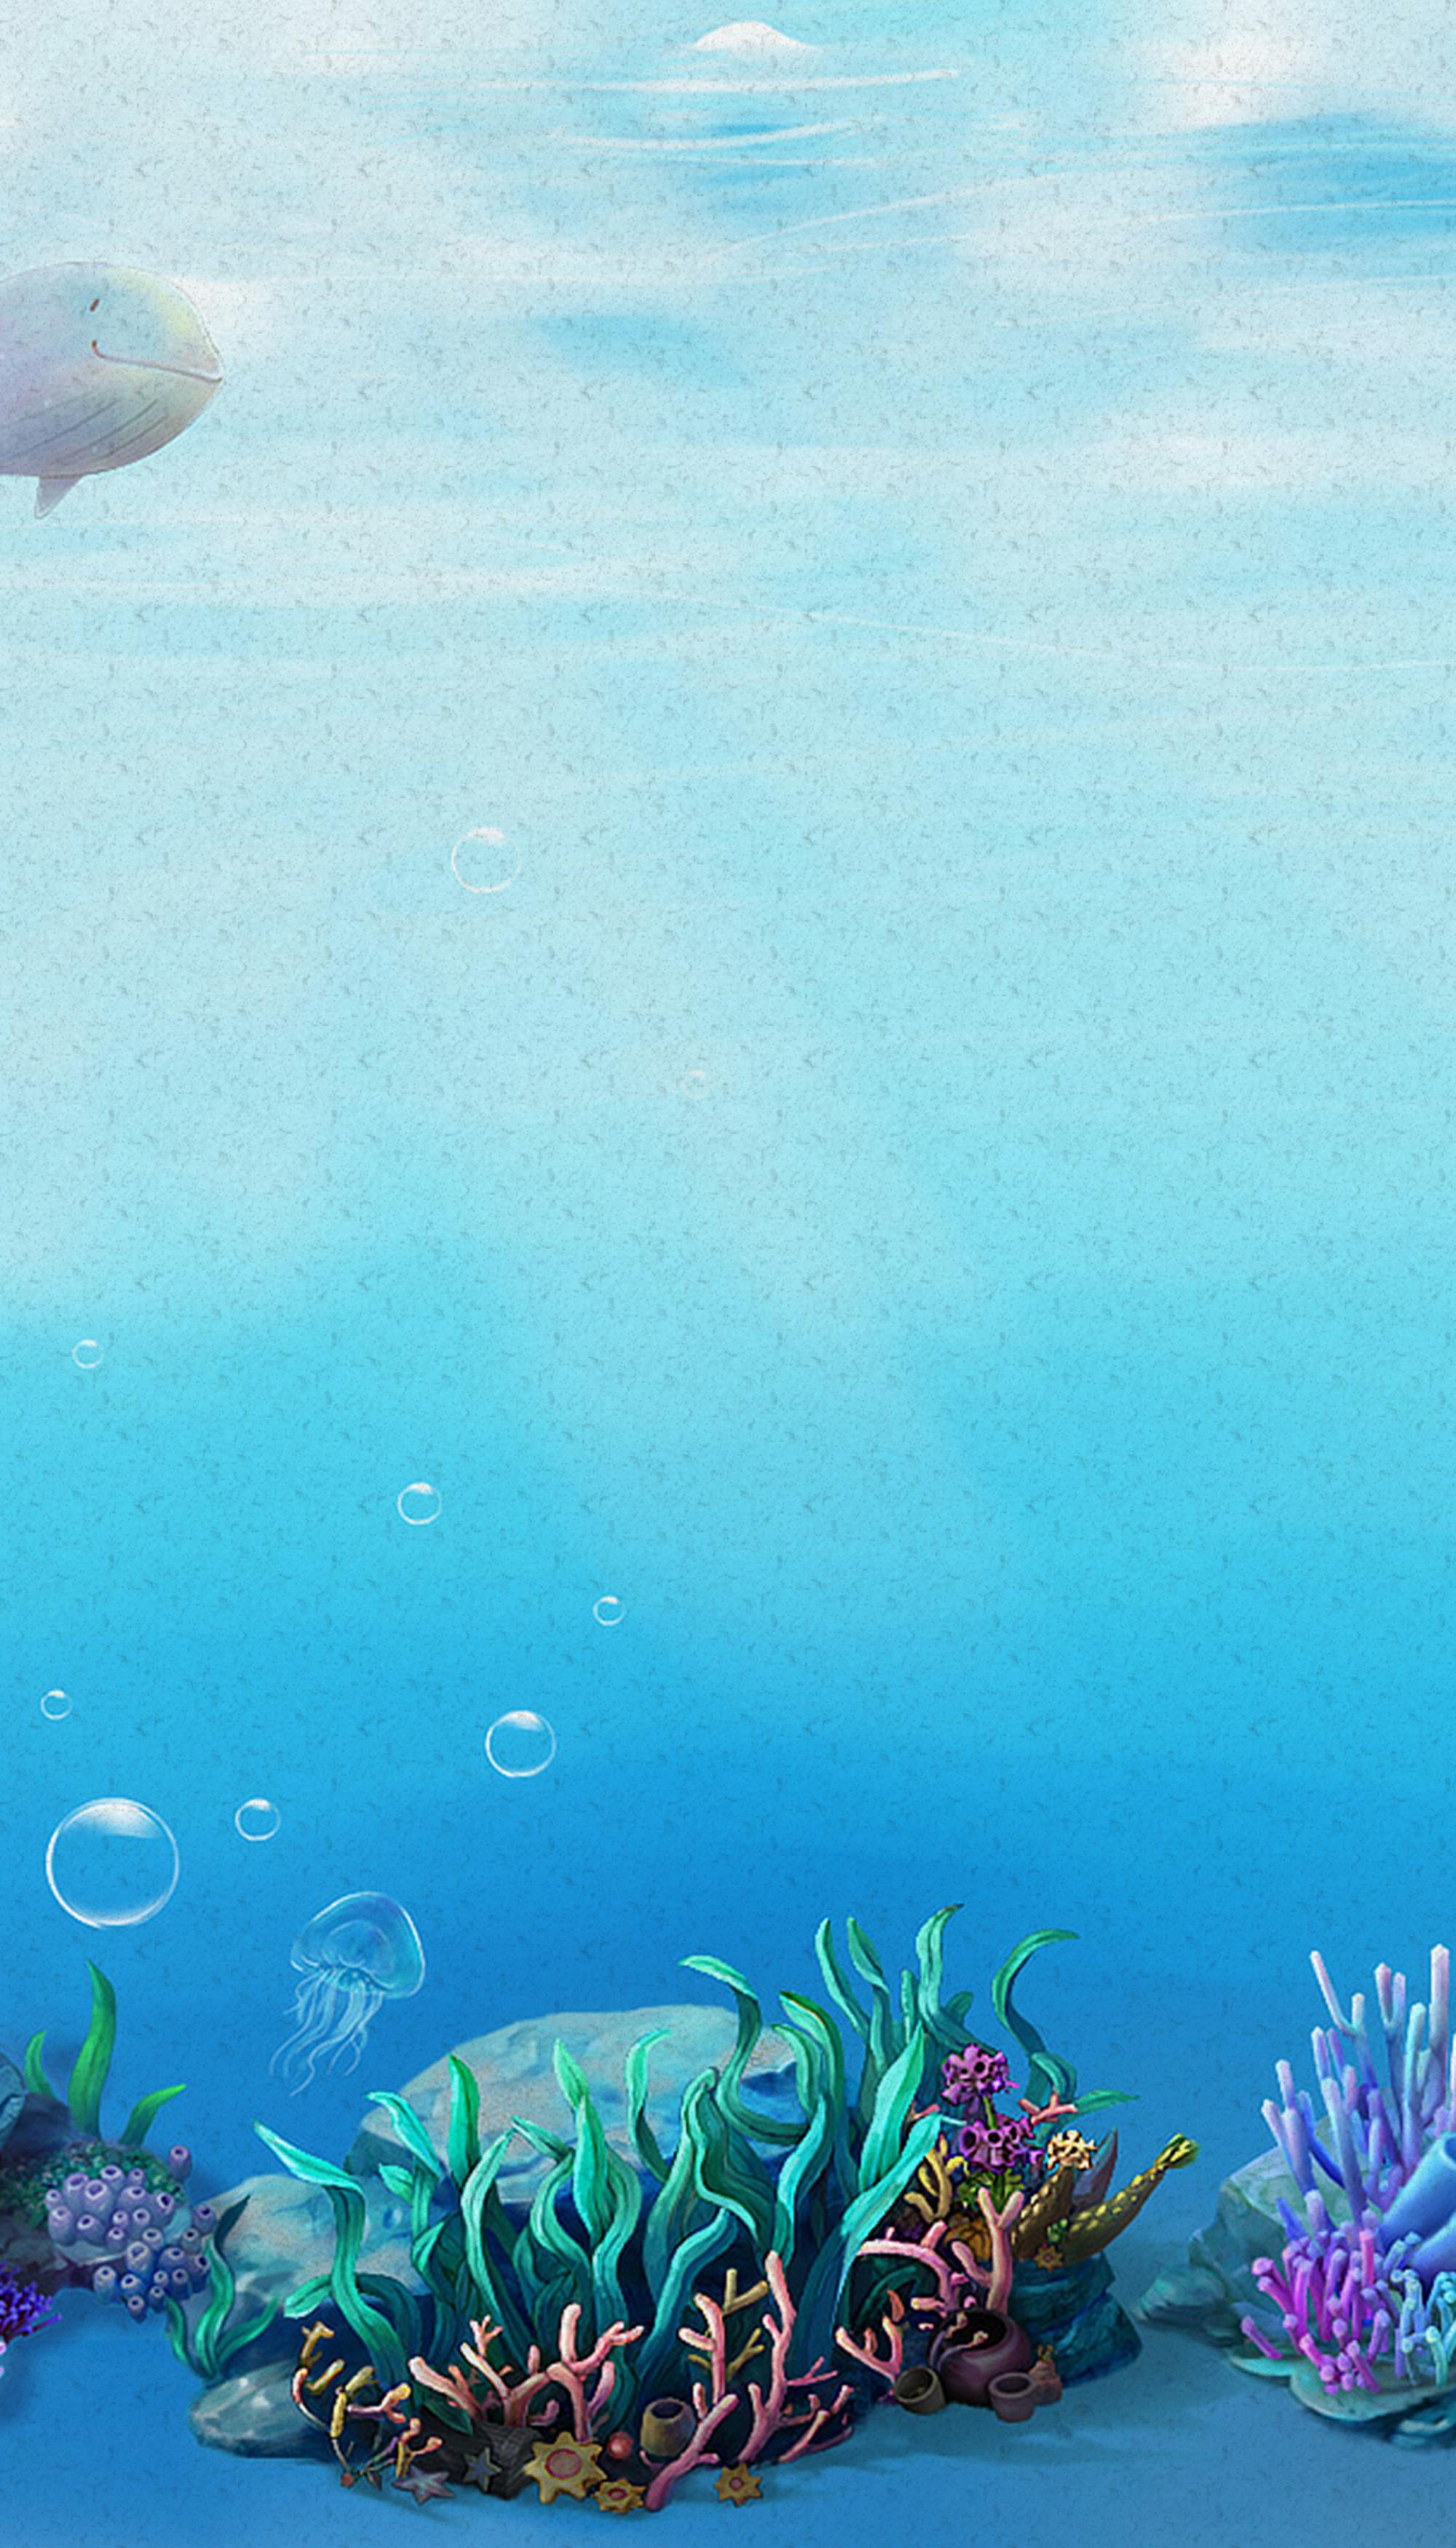 underwater world poster background  ocean  biological